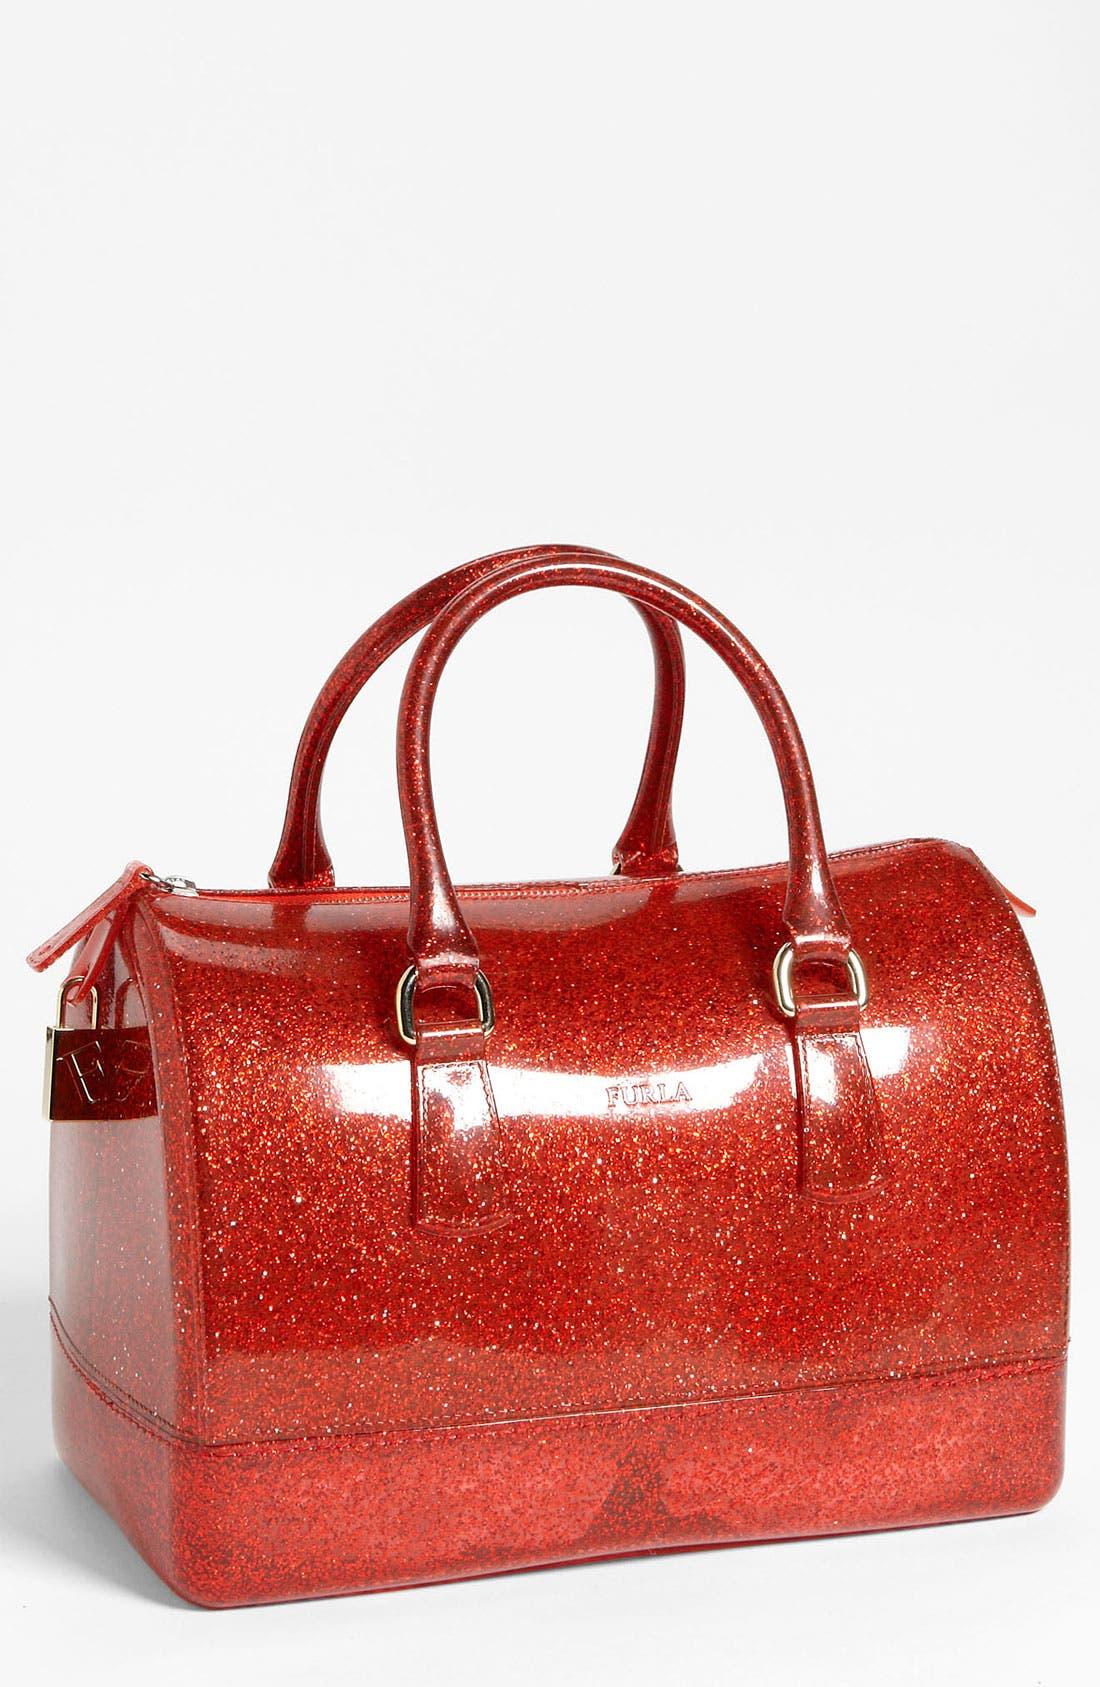 Main Image - Furla 'Candy - Glitter' Rubber Satchel